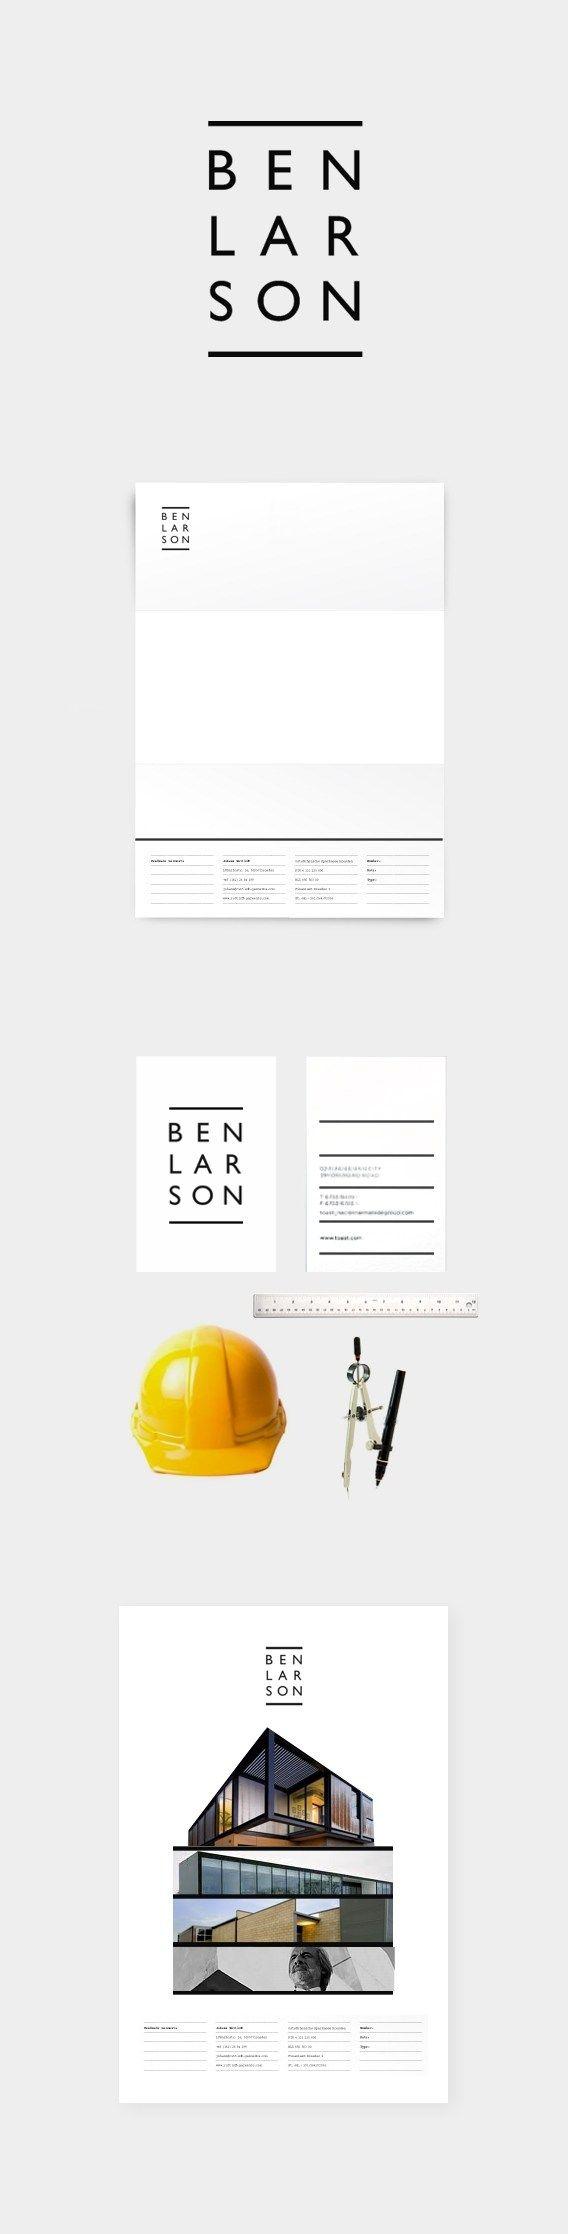 summer internship resume template%0A Visual identity architect